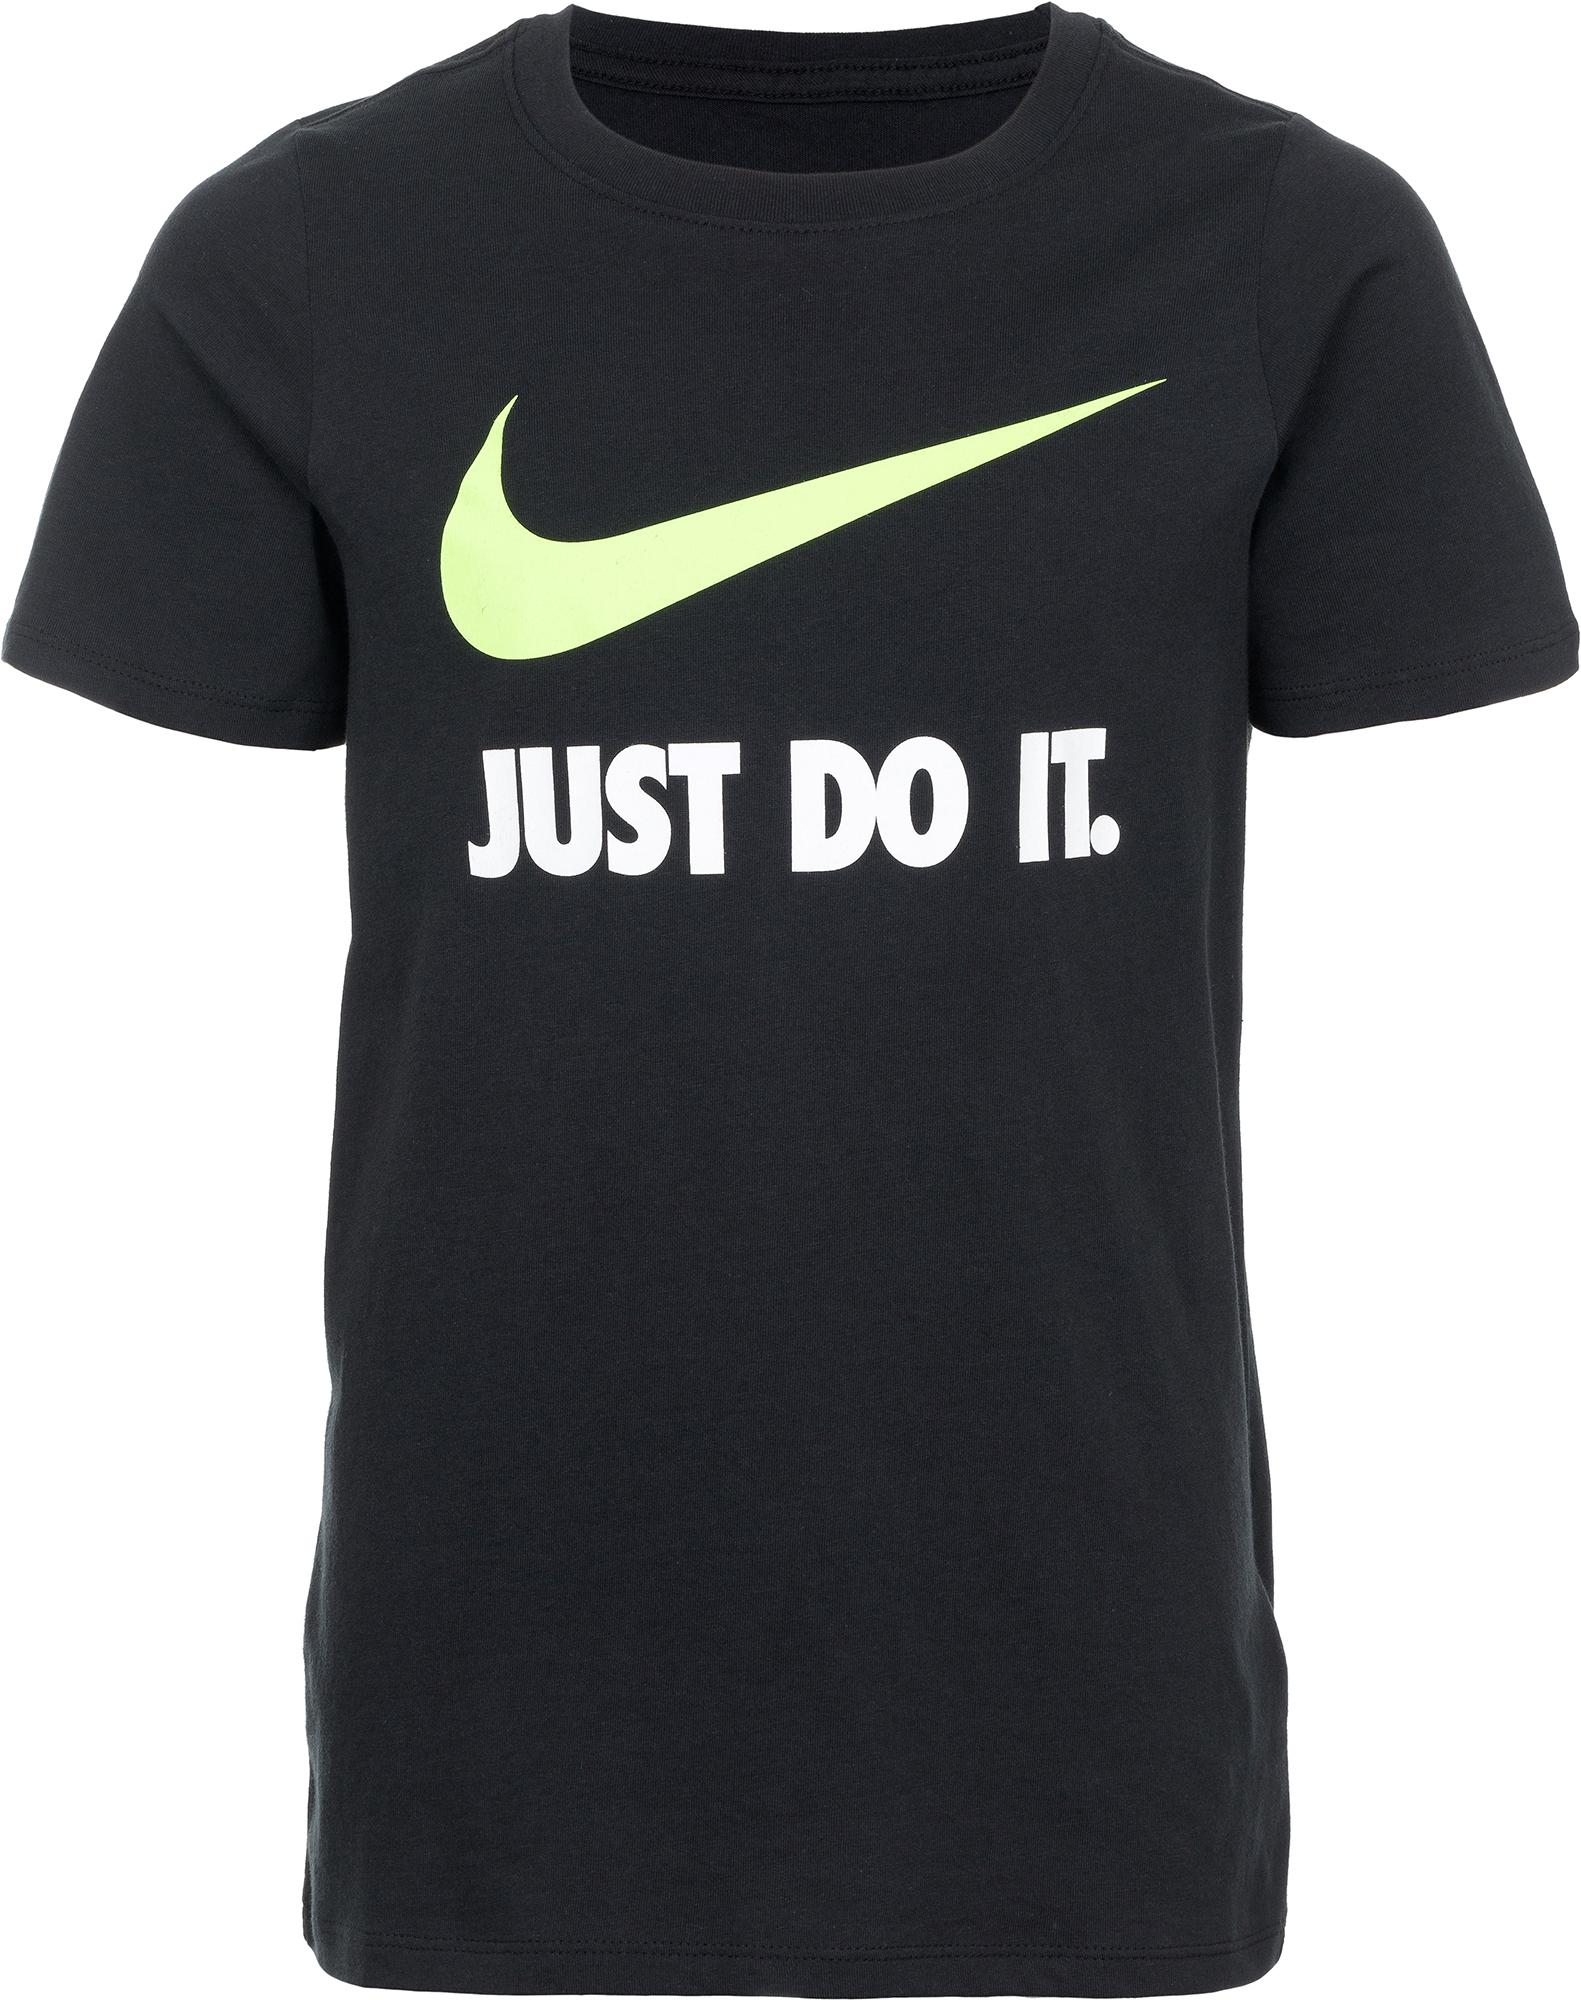 Nike Футболка для мальчиков Nike Just Do It, размер 158-170